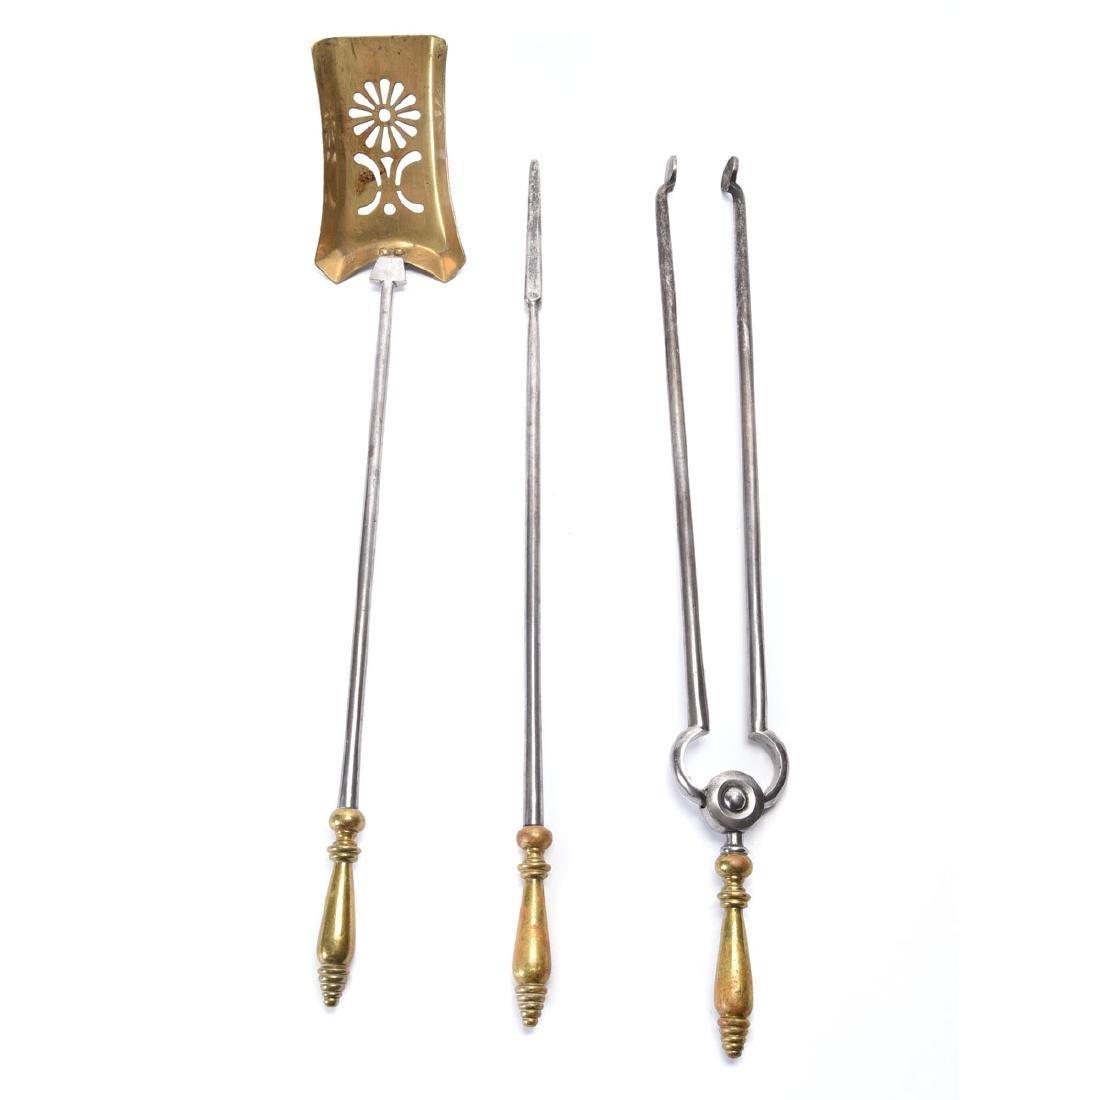 Set of Late Georgian Polished Steel Fire Tools